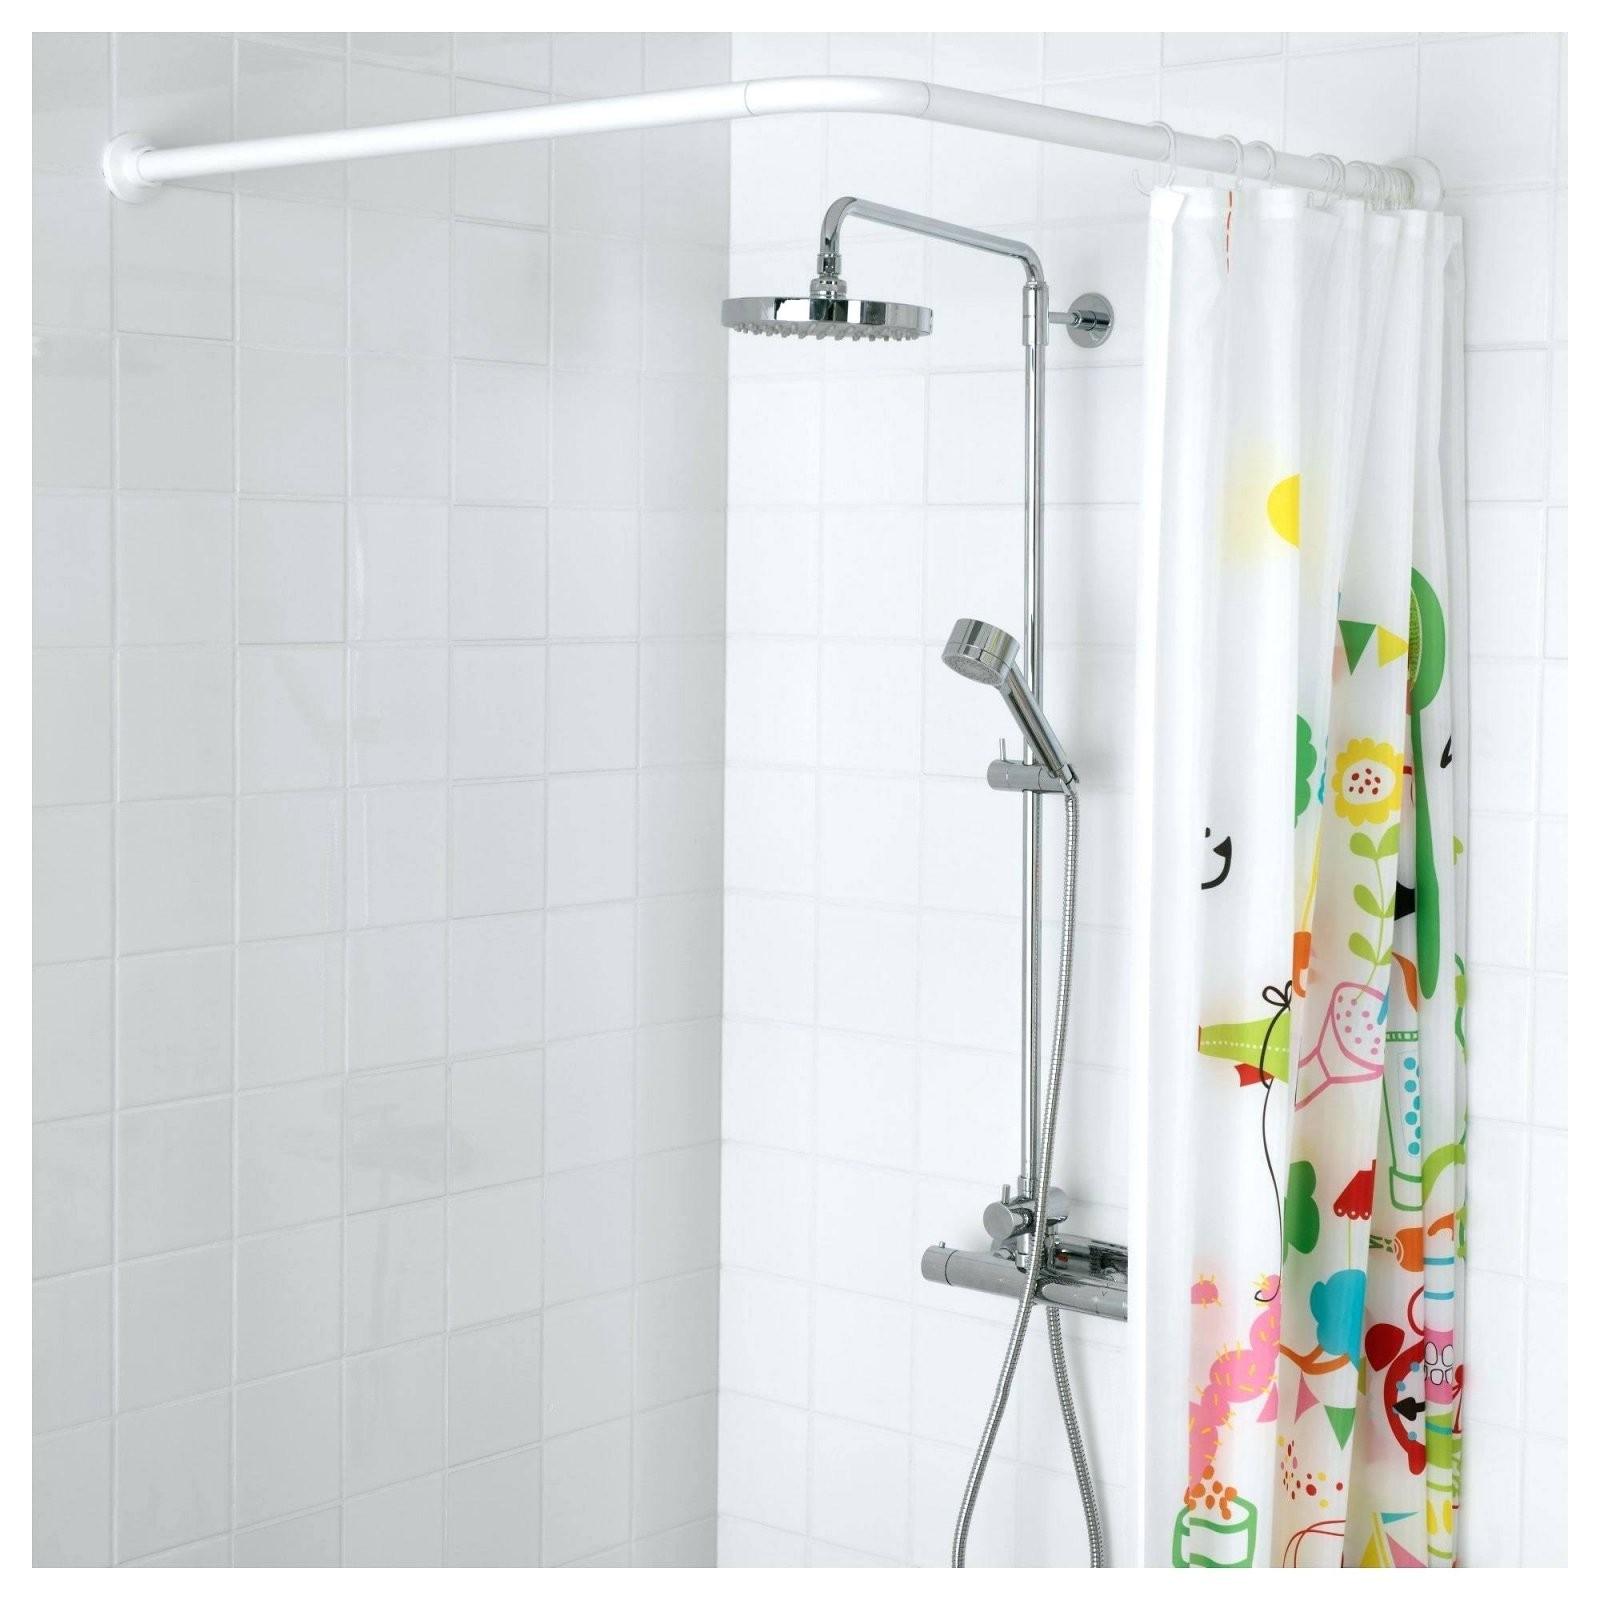 Duschvorhangstange L Form Duschvorhangstangen U Fur Badewannen von Duschvorhangstange L Form Badewanne Photo